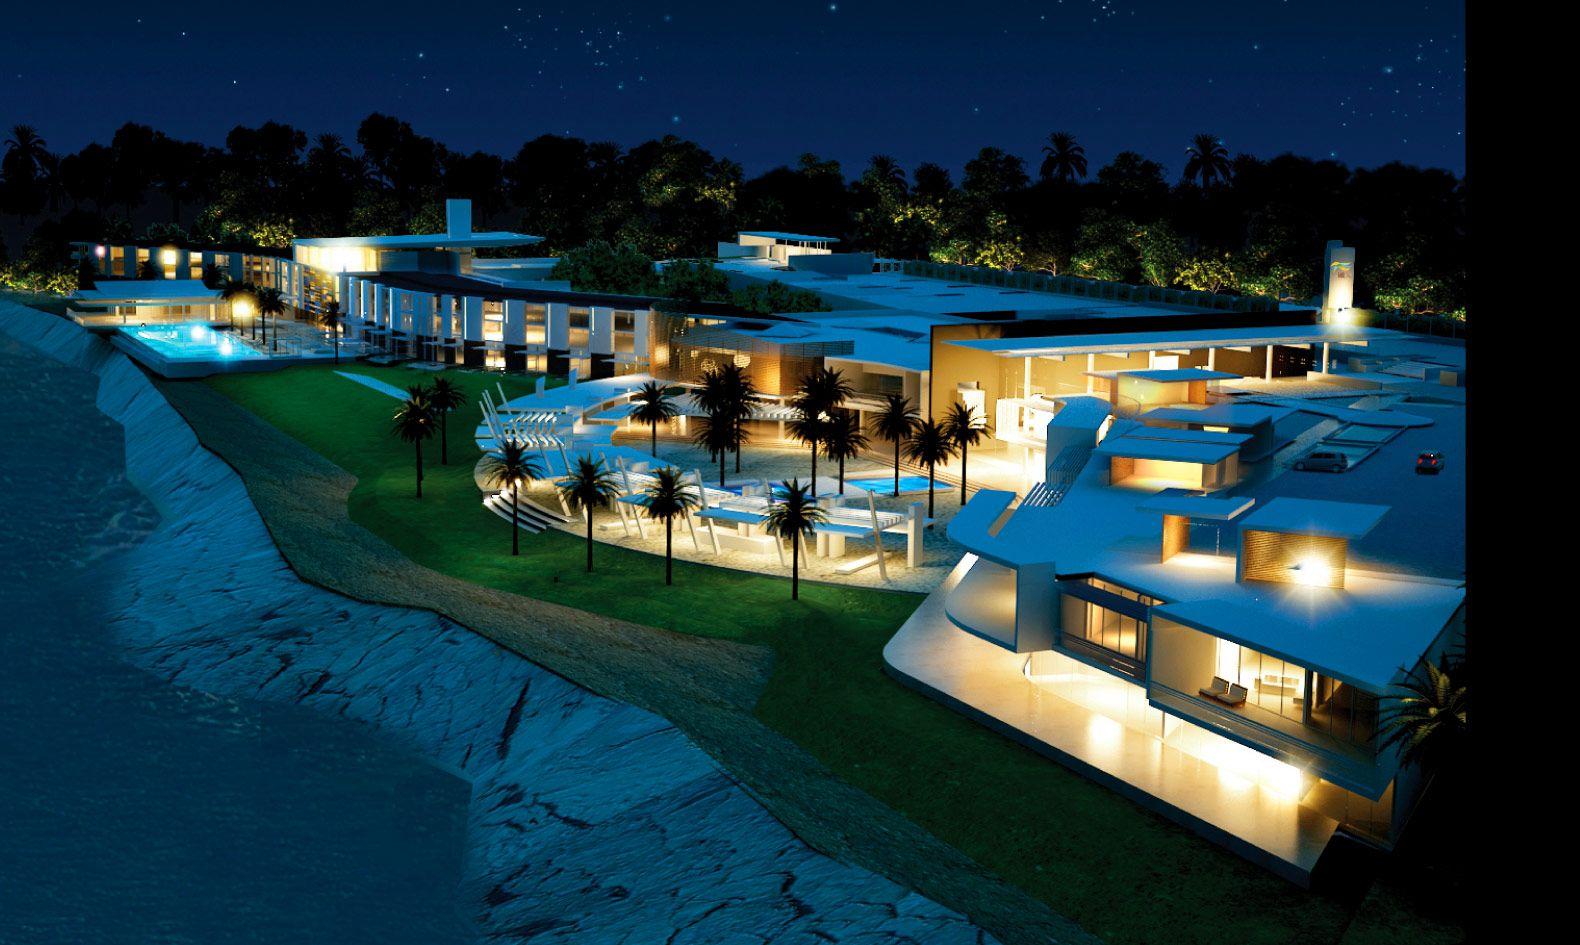 Radisson Blu Hotel By Saota Antoni Ociates Dakar Senegal 11